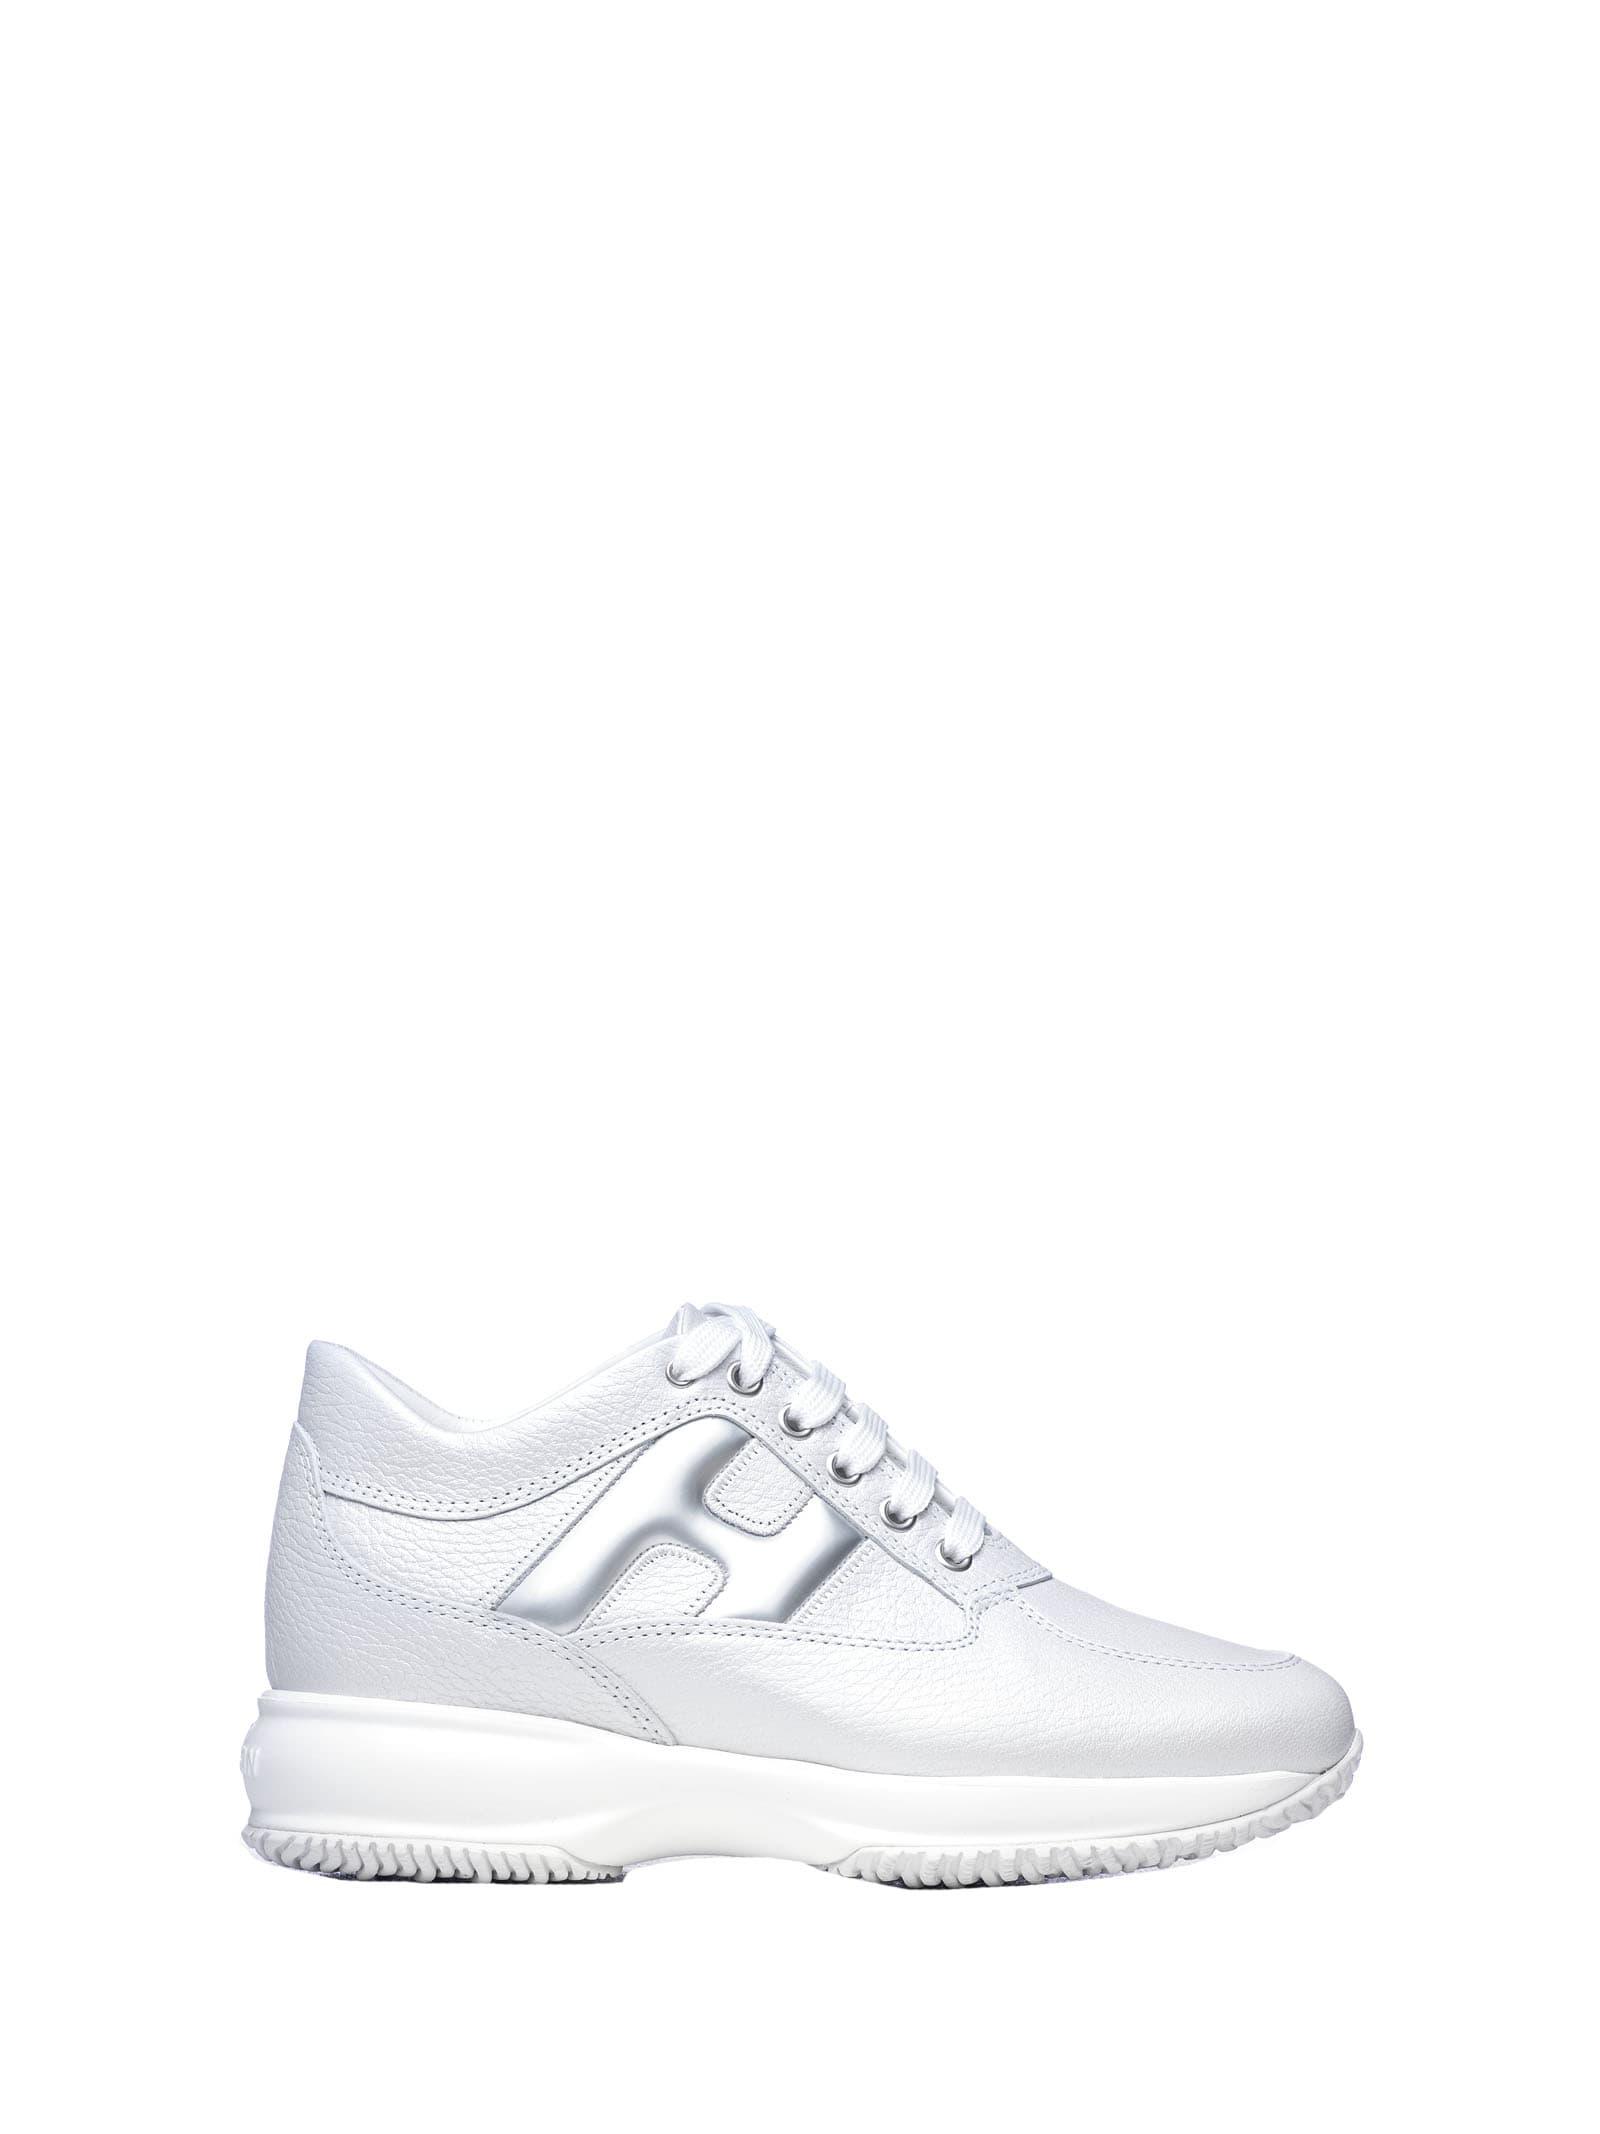 Hogan Shoes | italist, ALWAYS LIKE A SALE